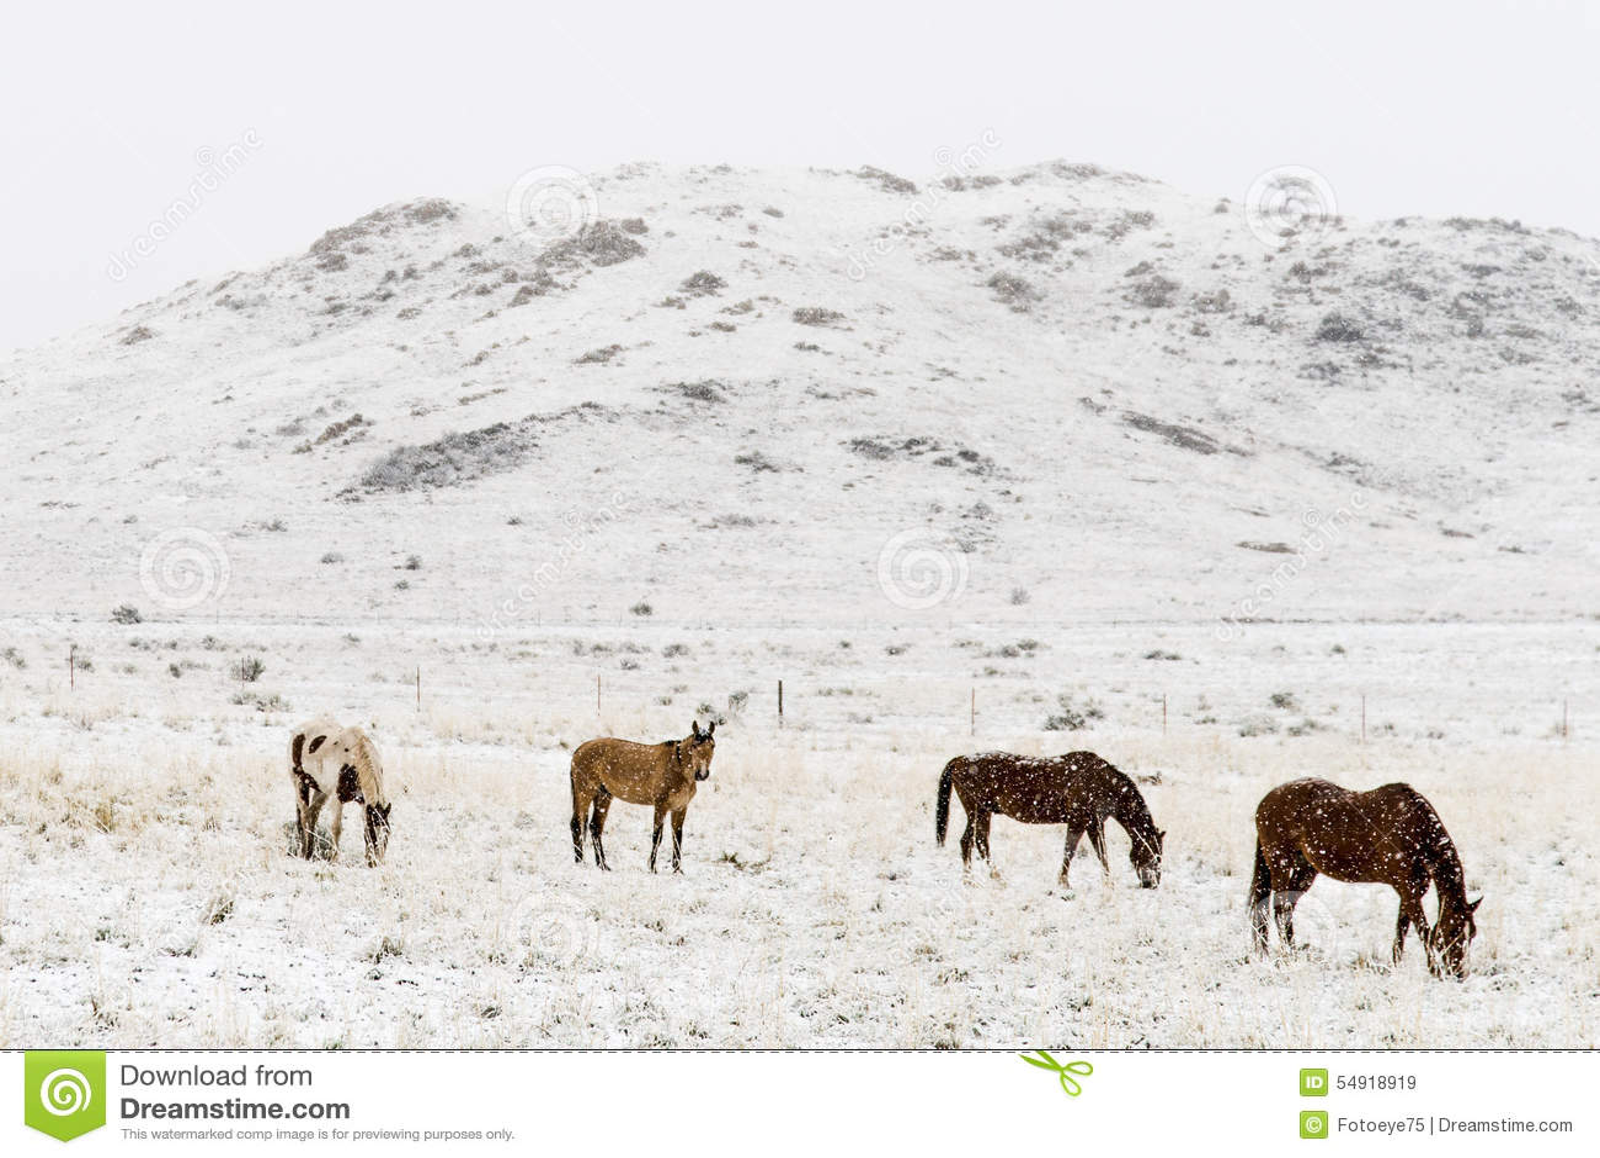 Horses grazing in winter snow colorado rocky mountains